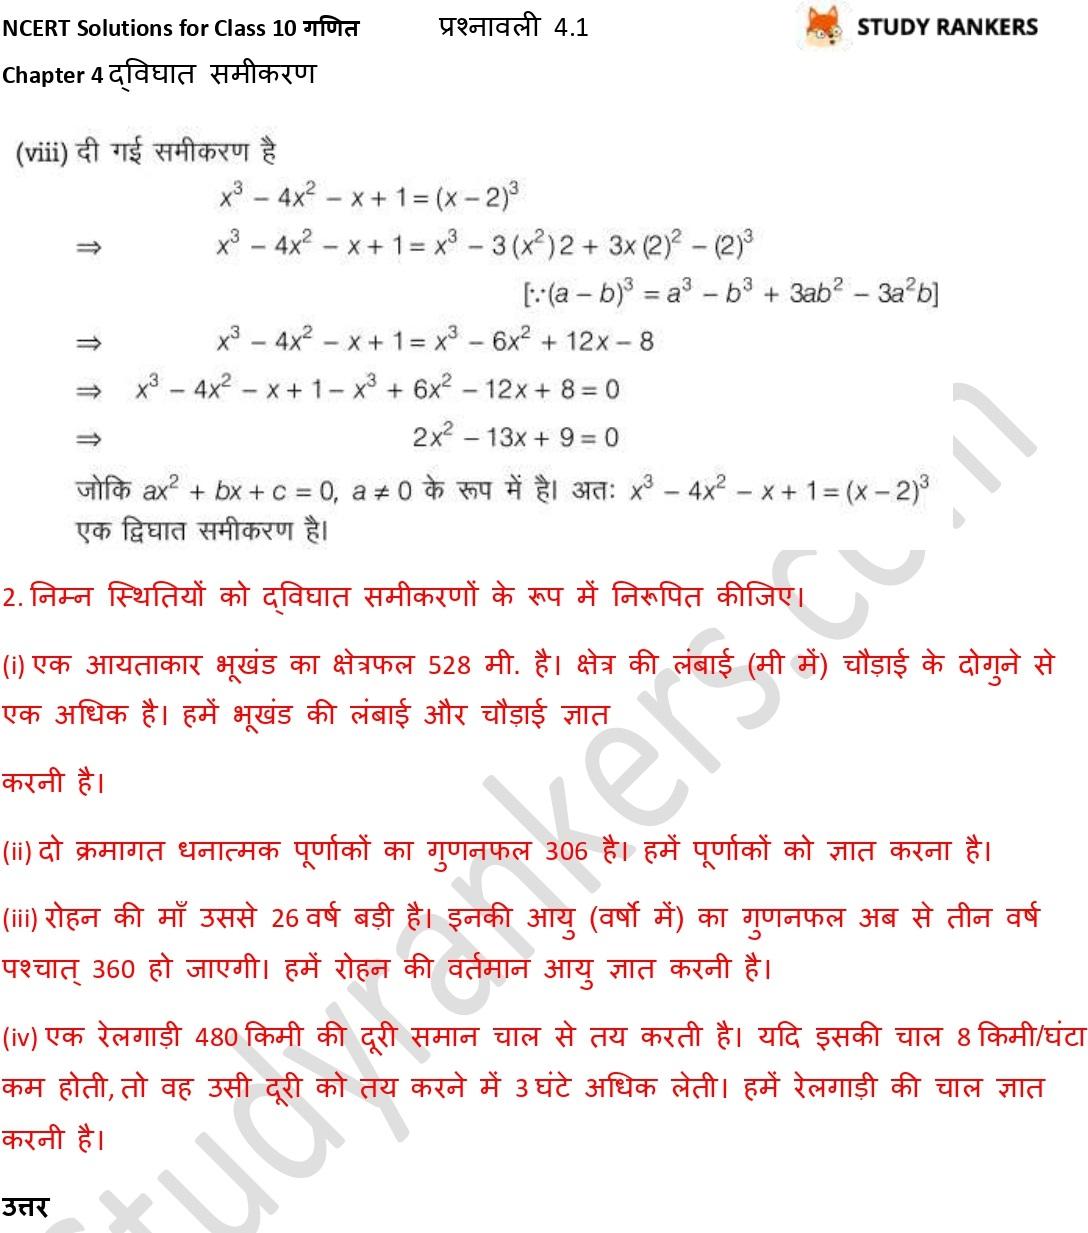 NCERT Solutions for Class 10 Maths Chapter 4 द्विघात समीकरण प्रश्नावली 4.1 Part 3